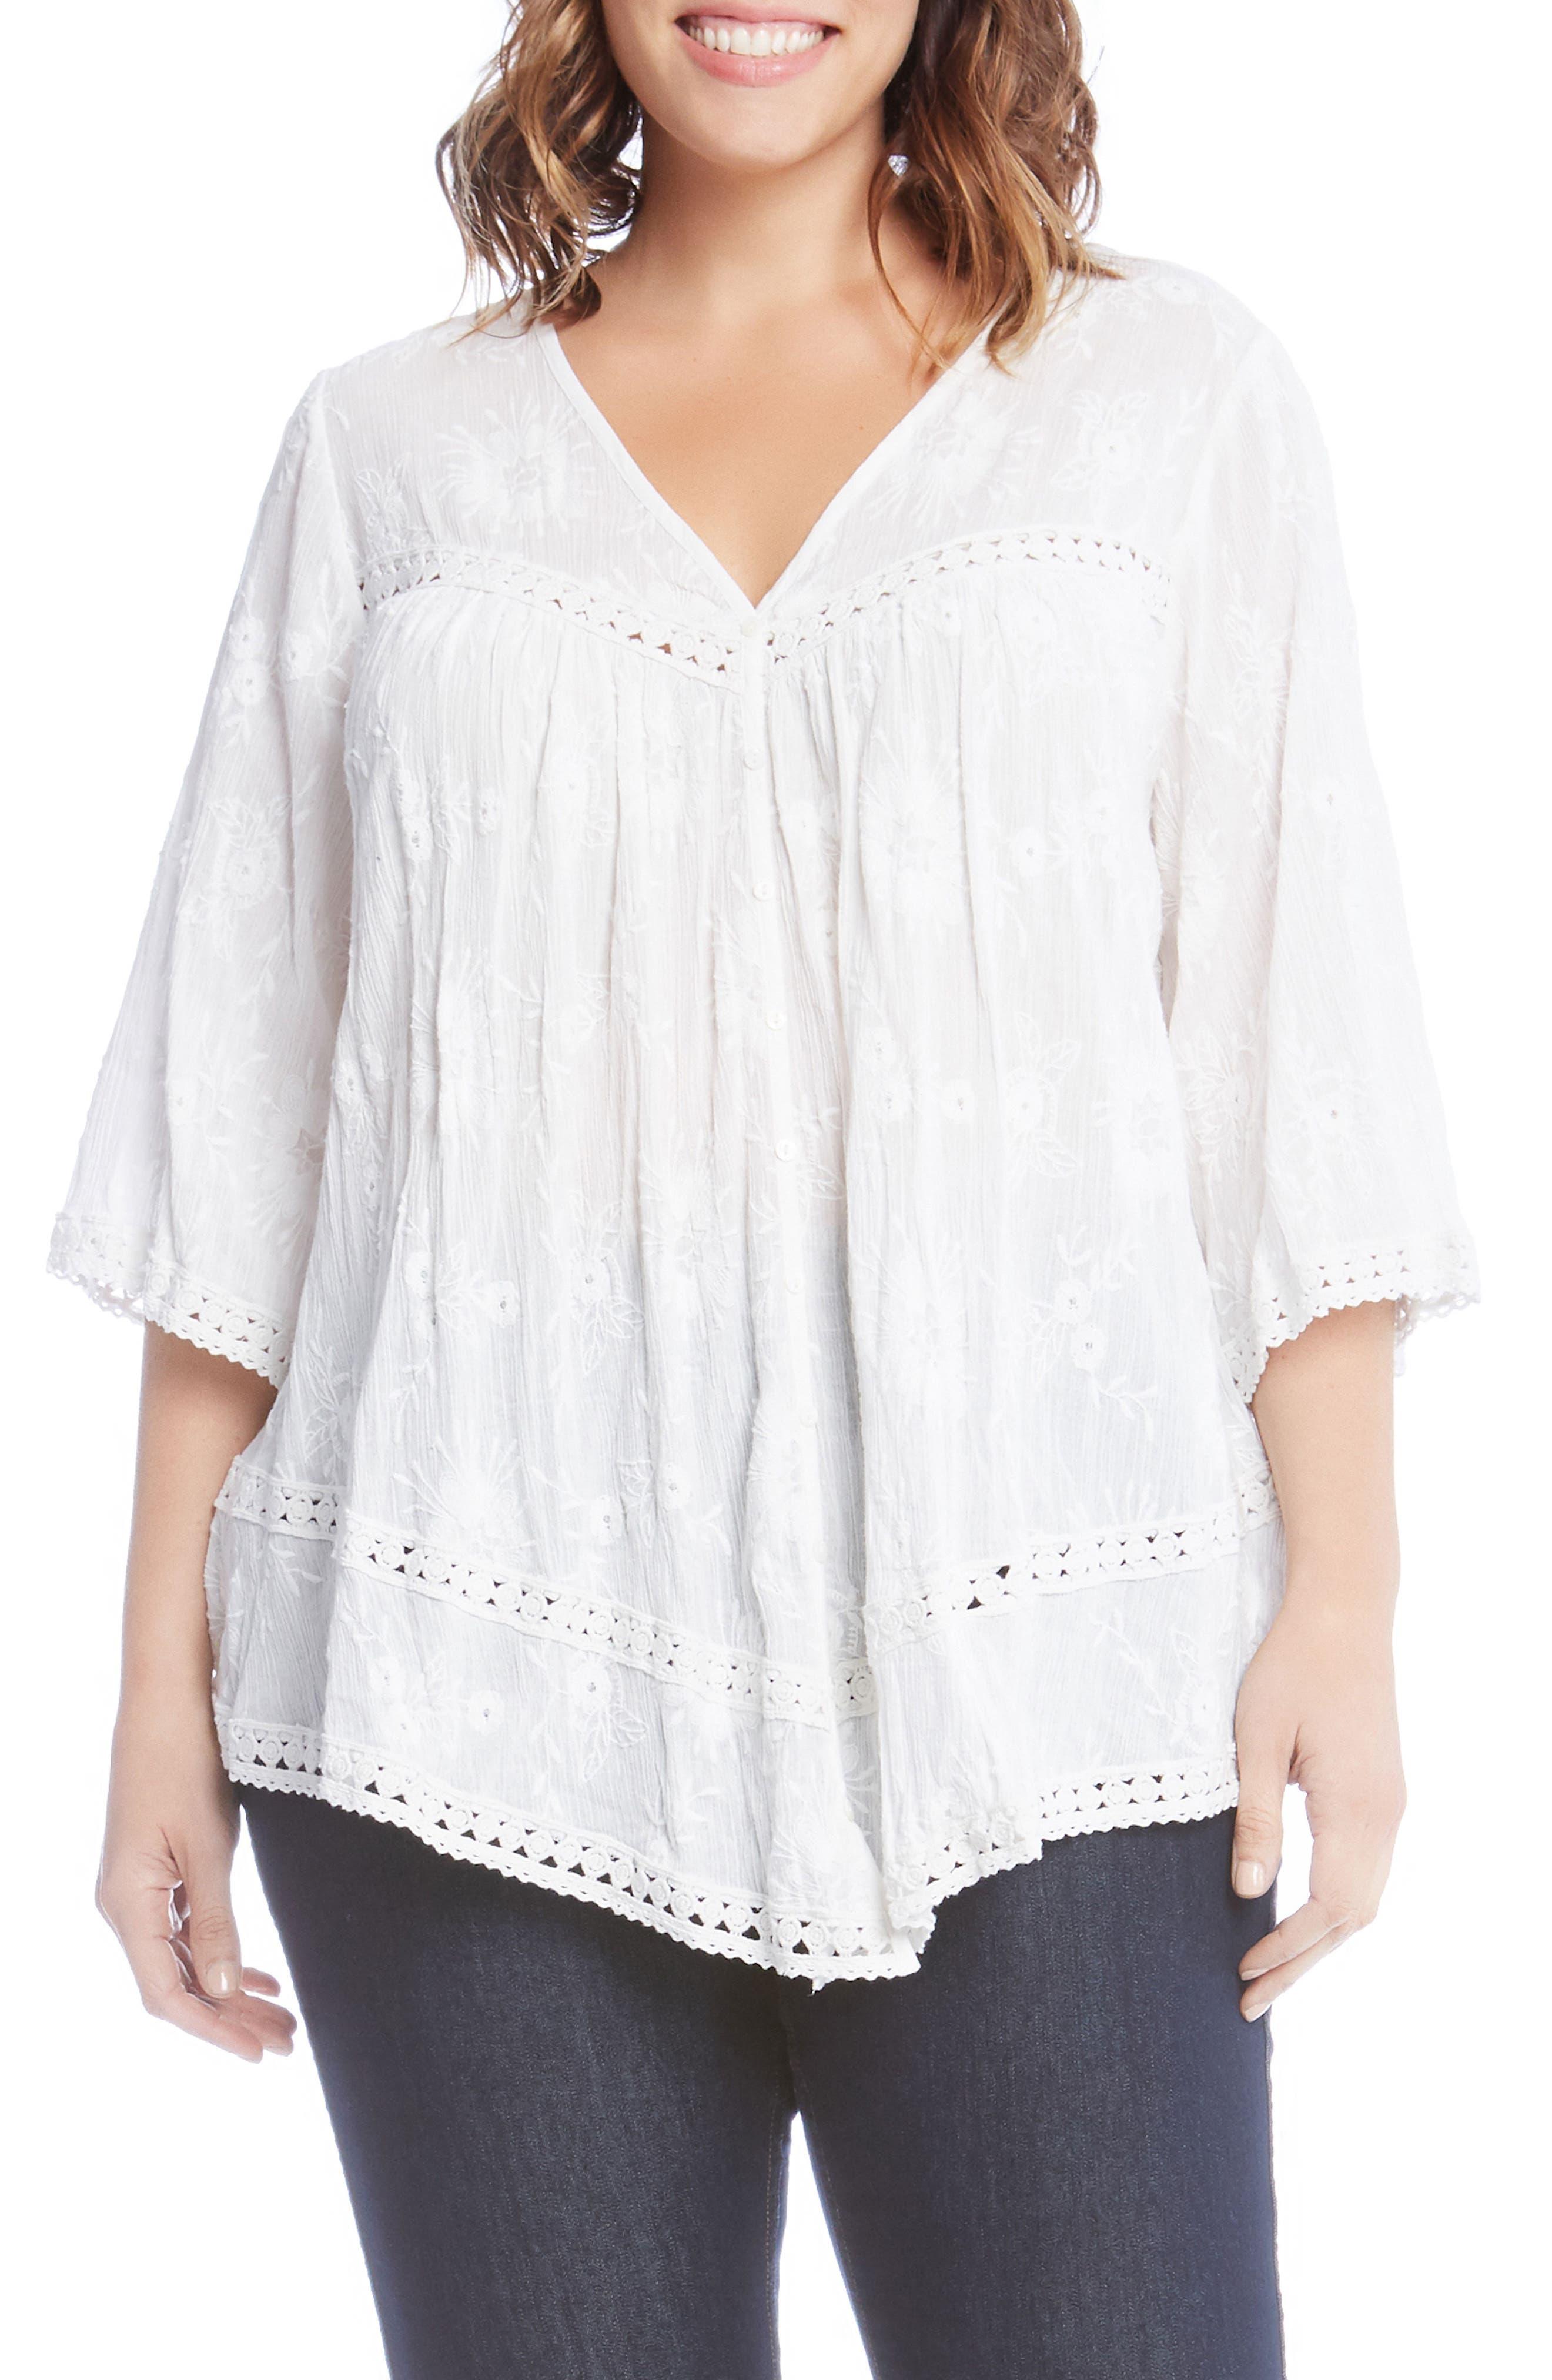 Alternate Image 1 Selected - Karen Kane Embroidered Gauze Top (Plus Size)